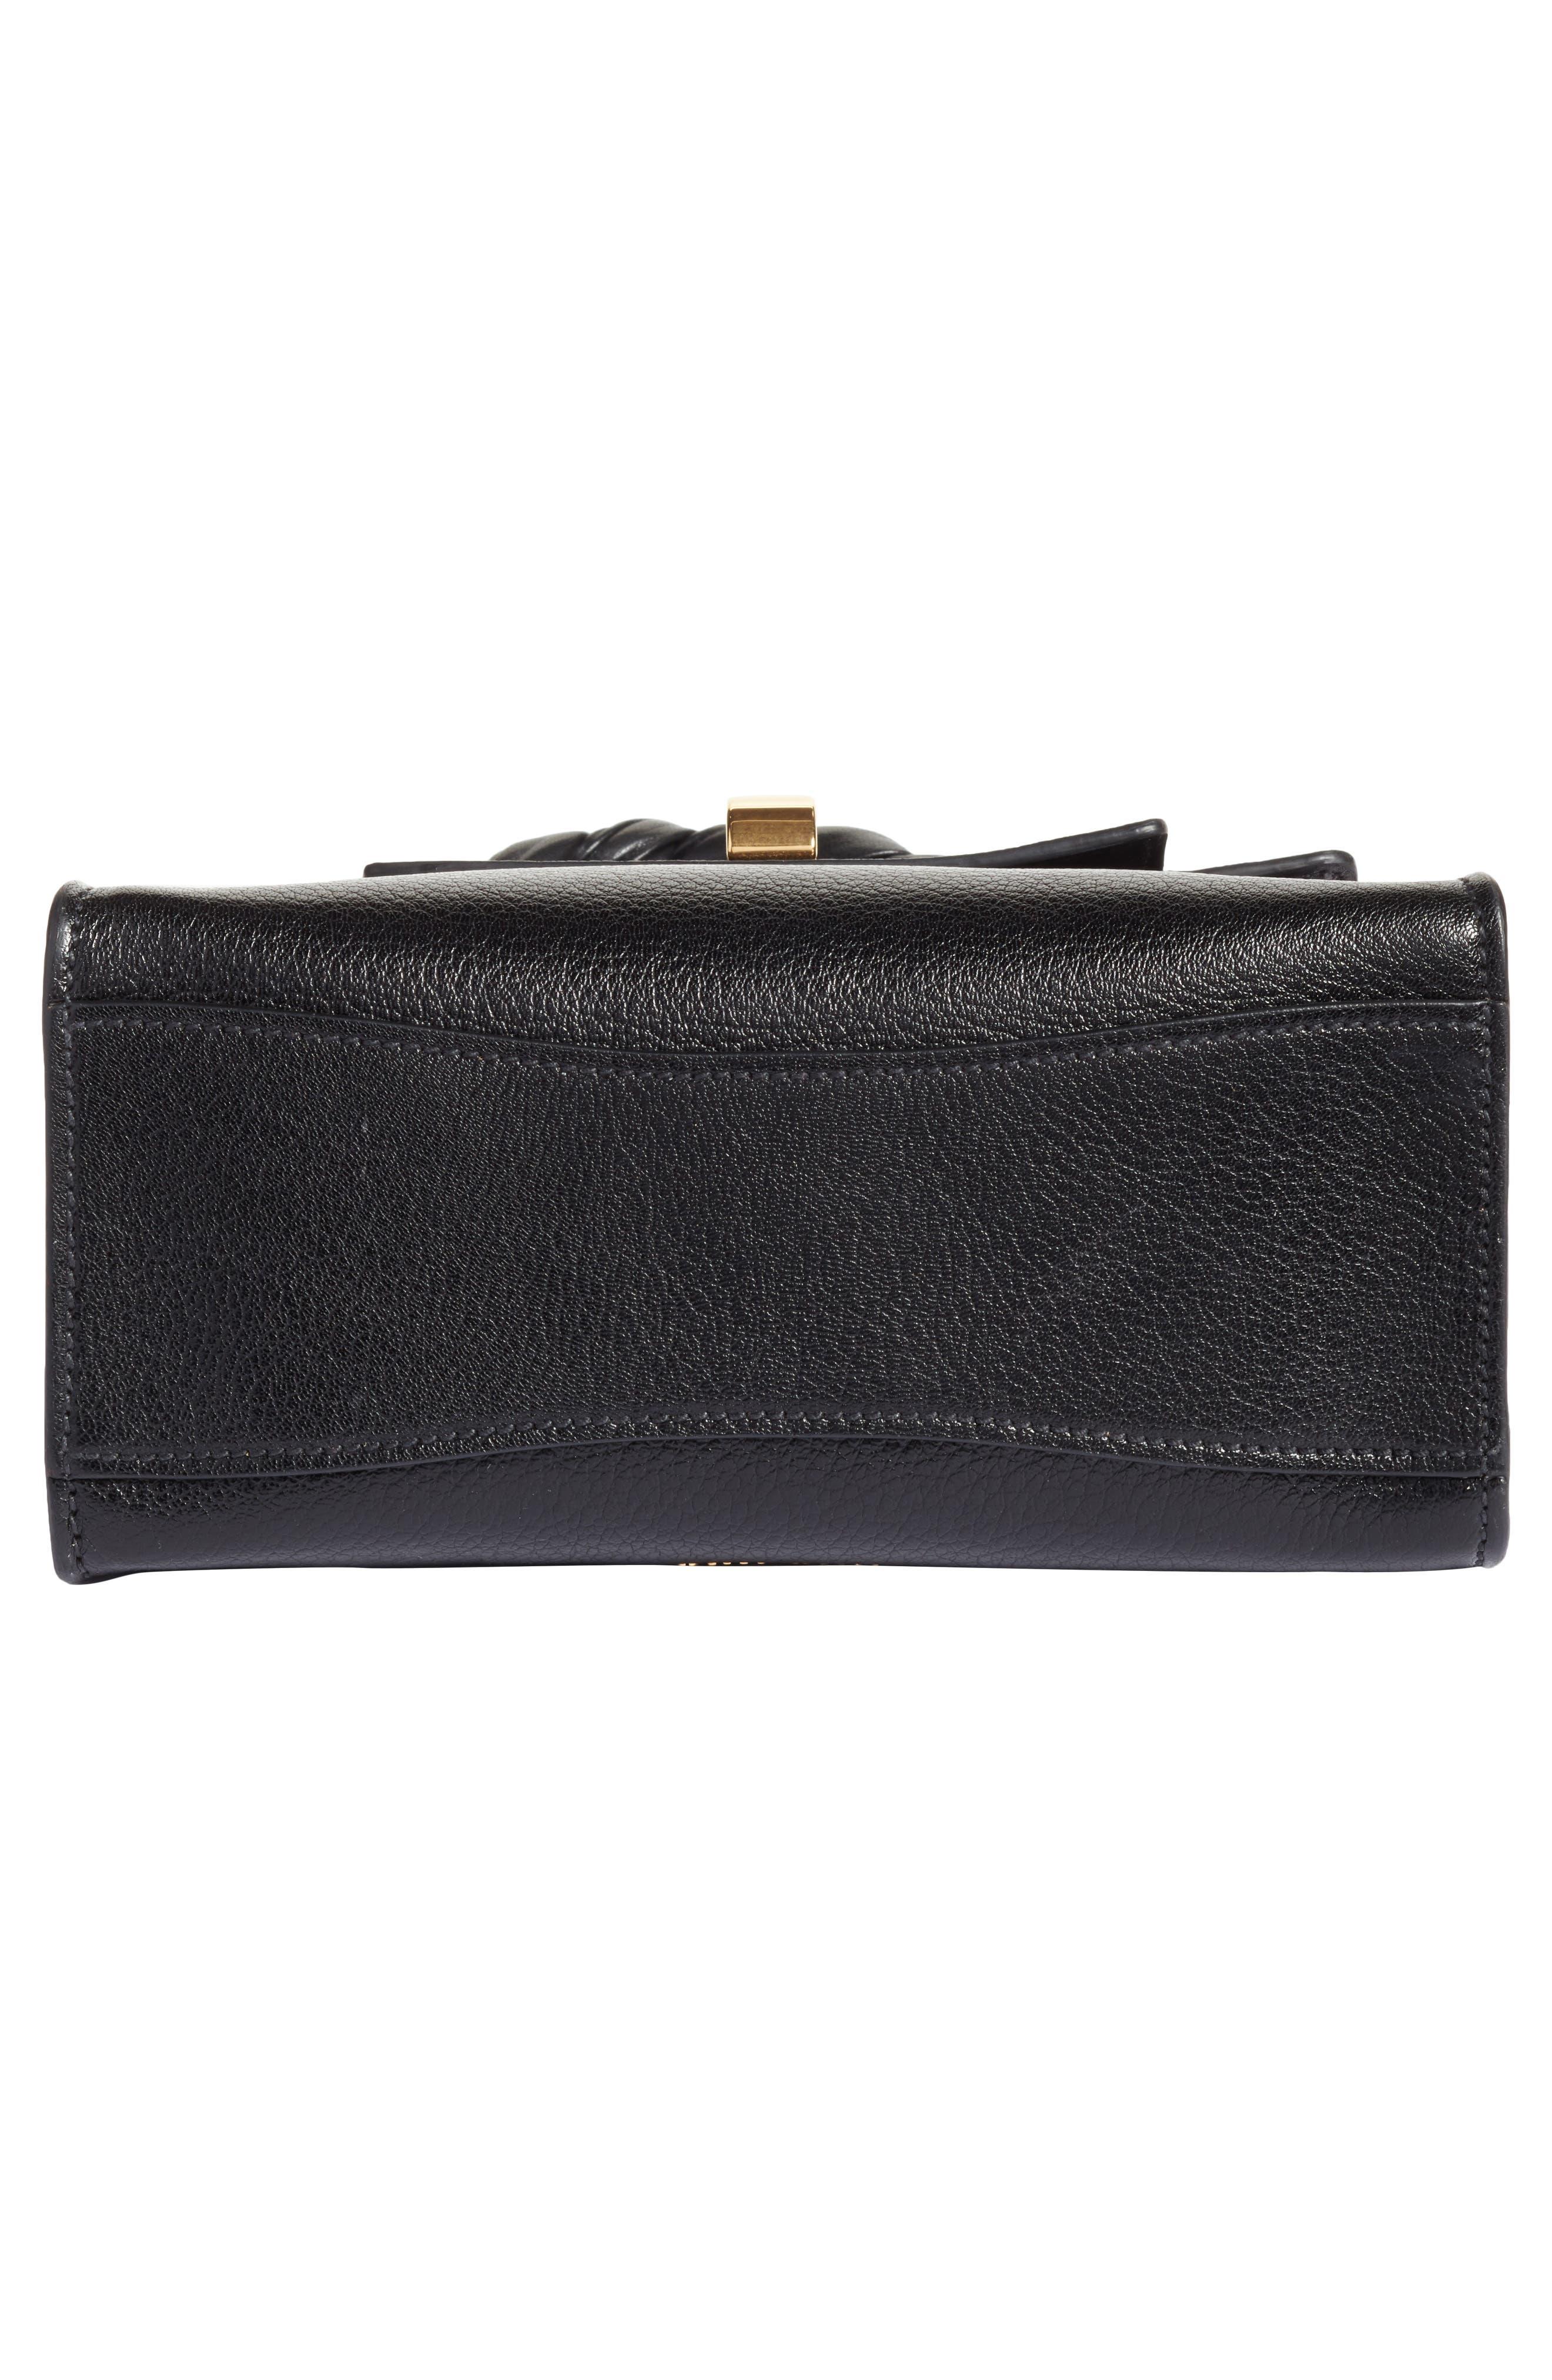 Madras Leather Top Handle Satchel,                             Alternate thumbnail 6, color,                             001